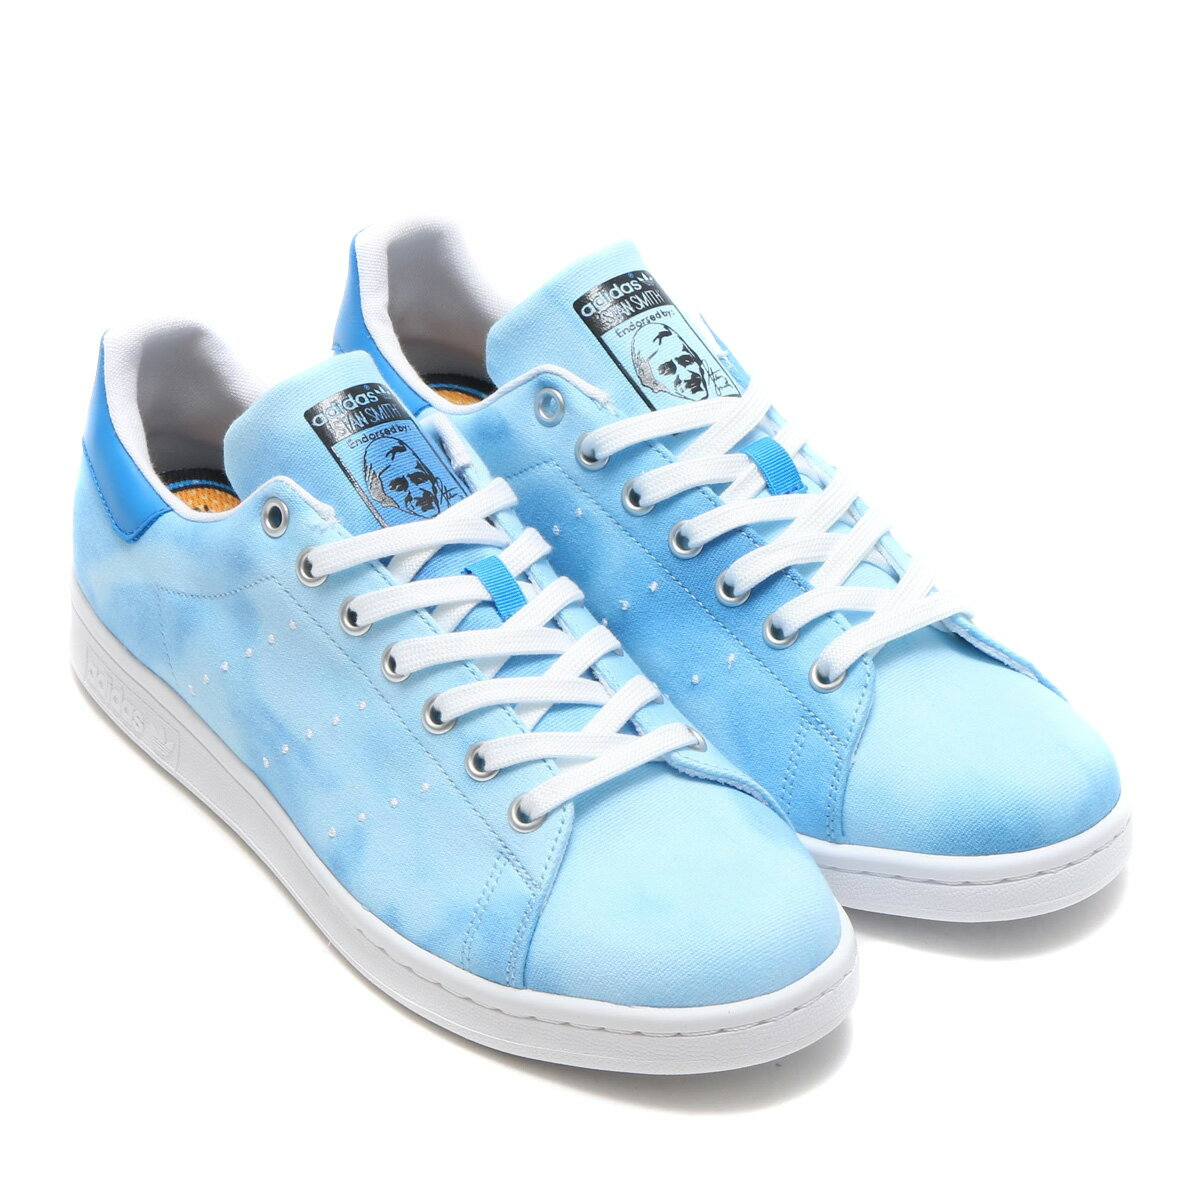 adidas Originals PW HU HOLI STAN SMITH (アディダス オリジナルス ファレル ウィリアムス HU HOLI スタンスミス) Blue / Running White / Running White【メンズ スニーカー】18SS-S